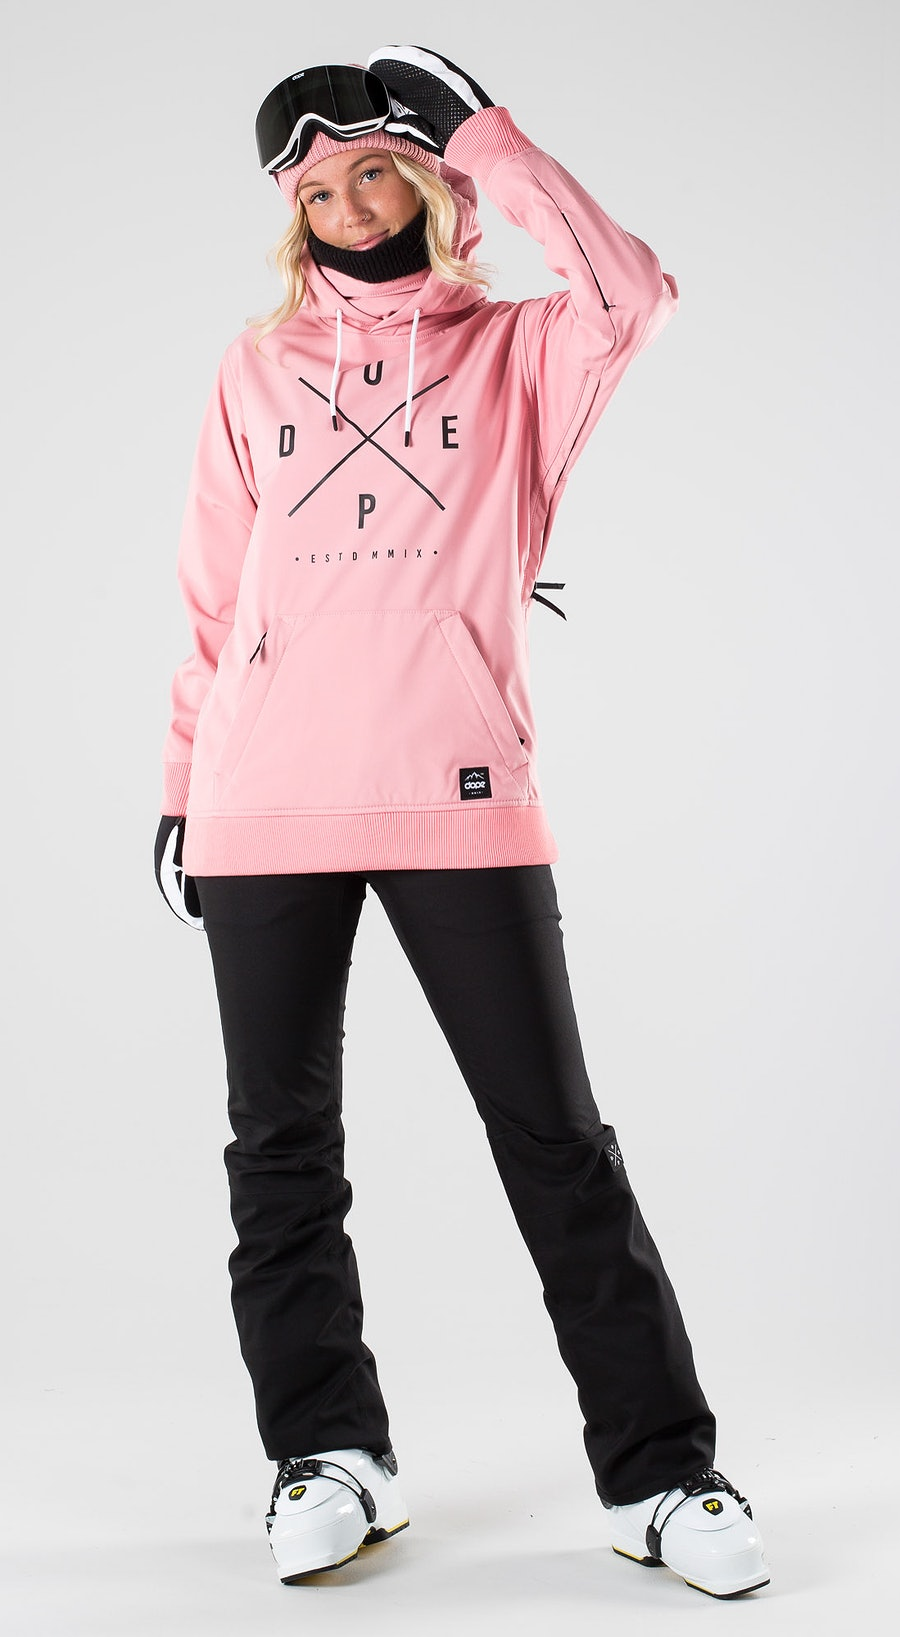 Dope Yeti W Pink Ski clothing Multi